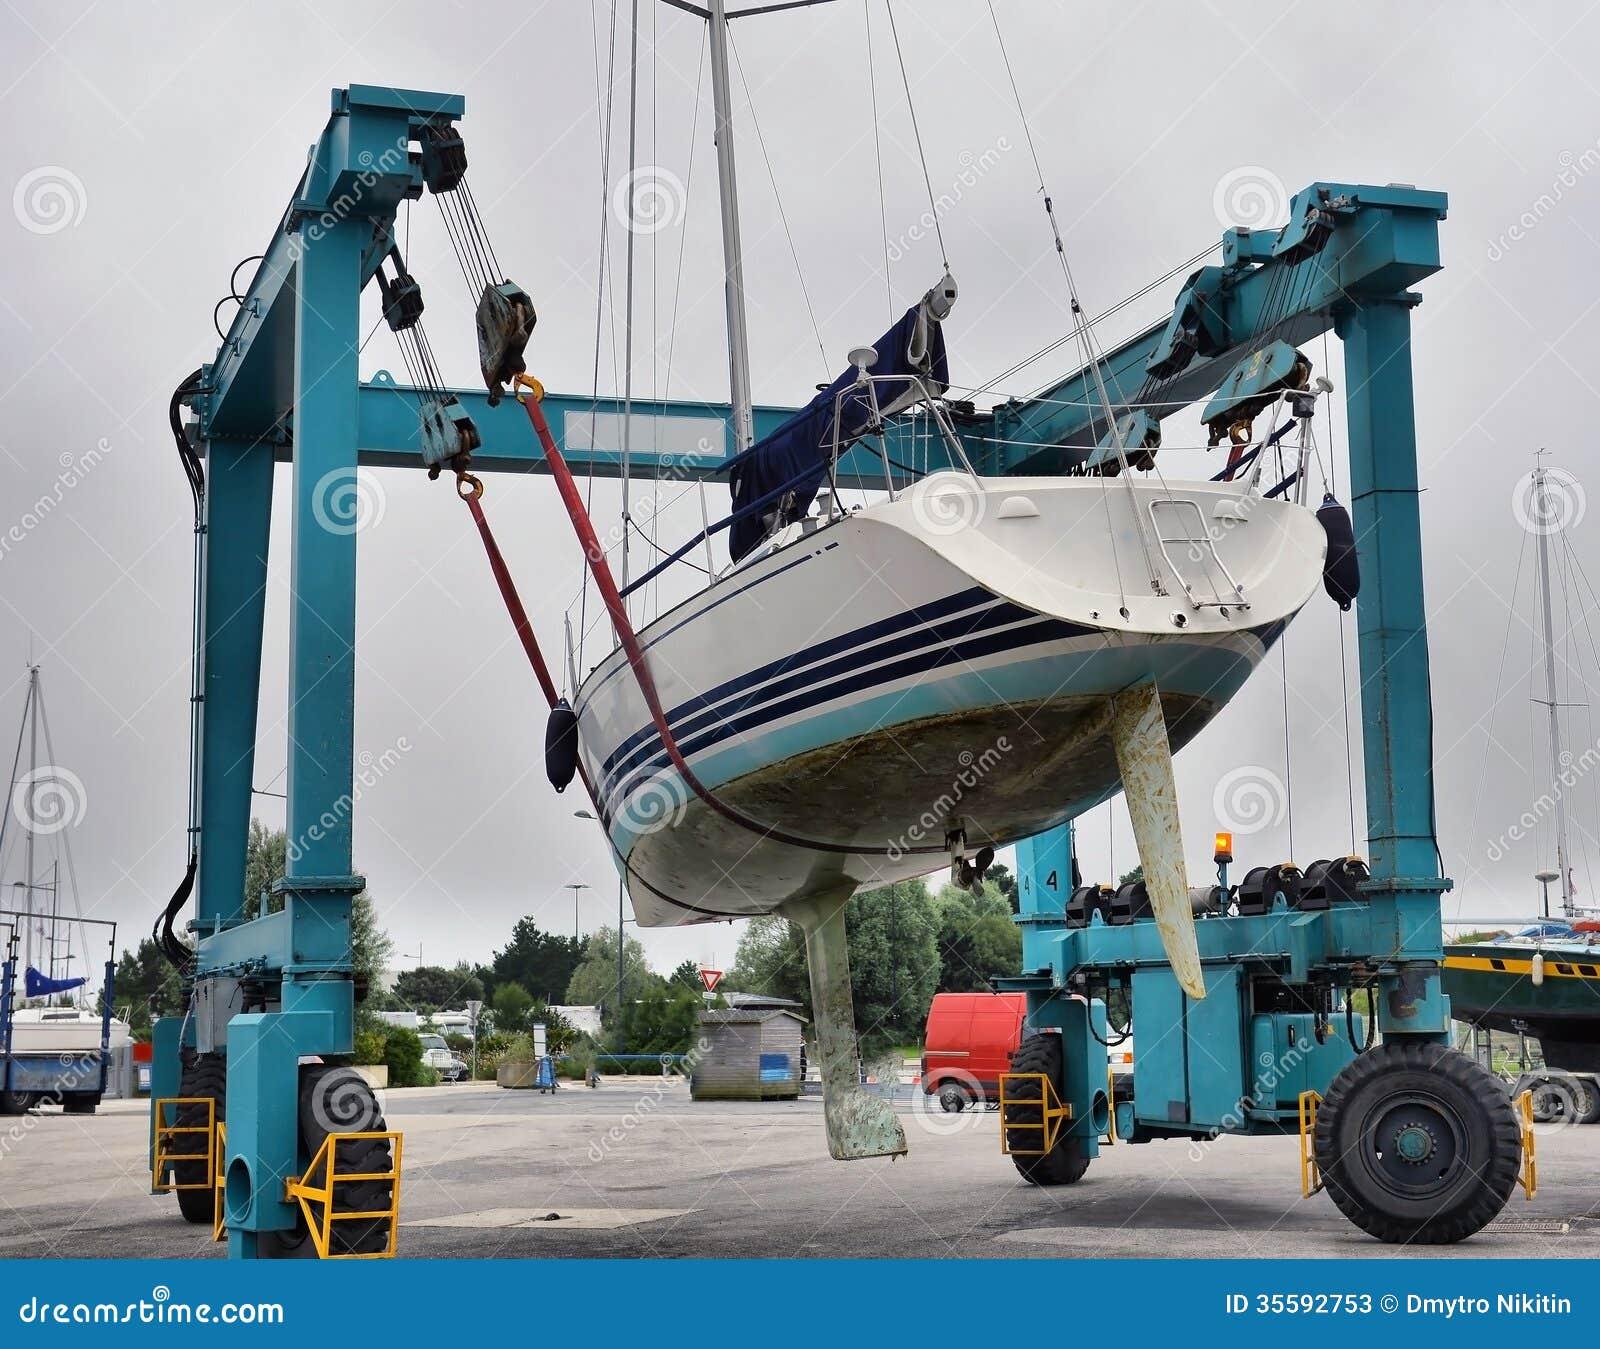 Crane lifting boats stock image. Image of ocean, equipment - 35592753